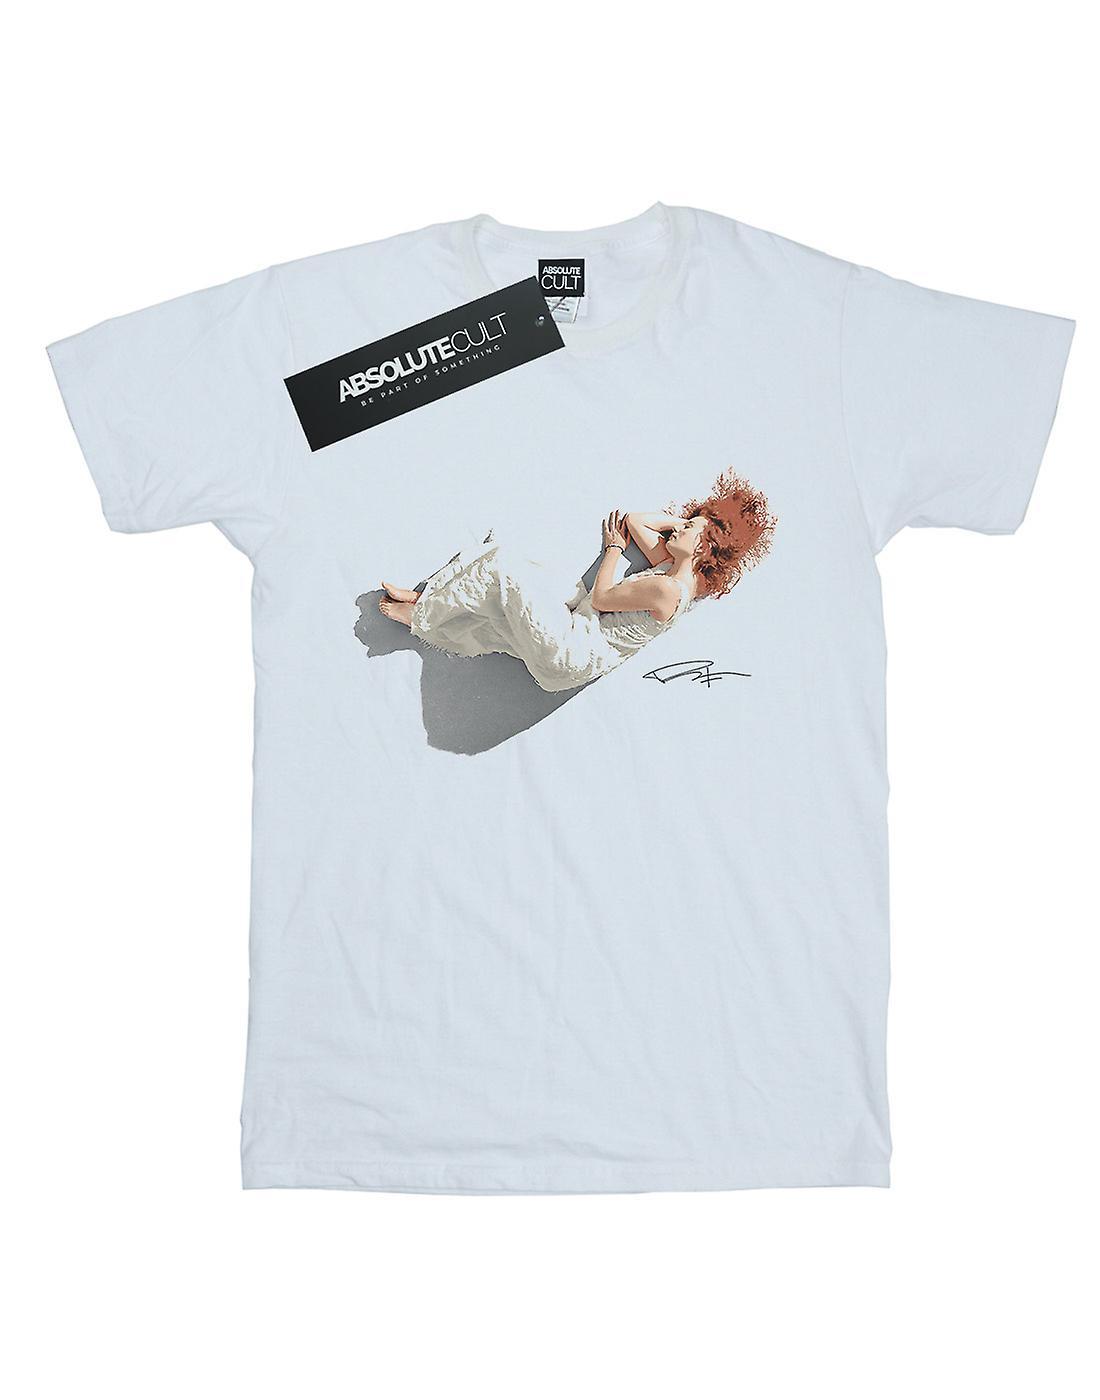 Tori Amos Boys Under The Pink Signature T-Shirt